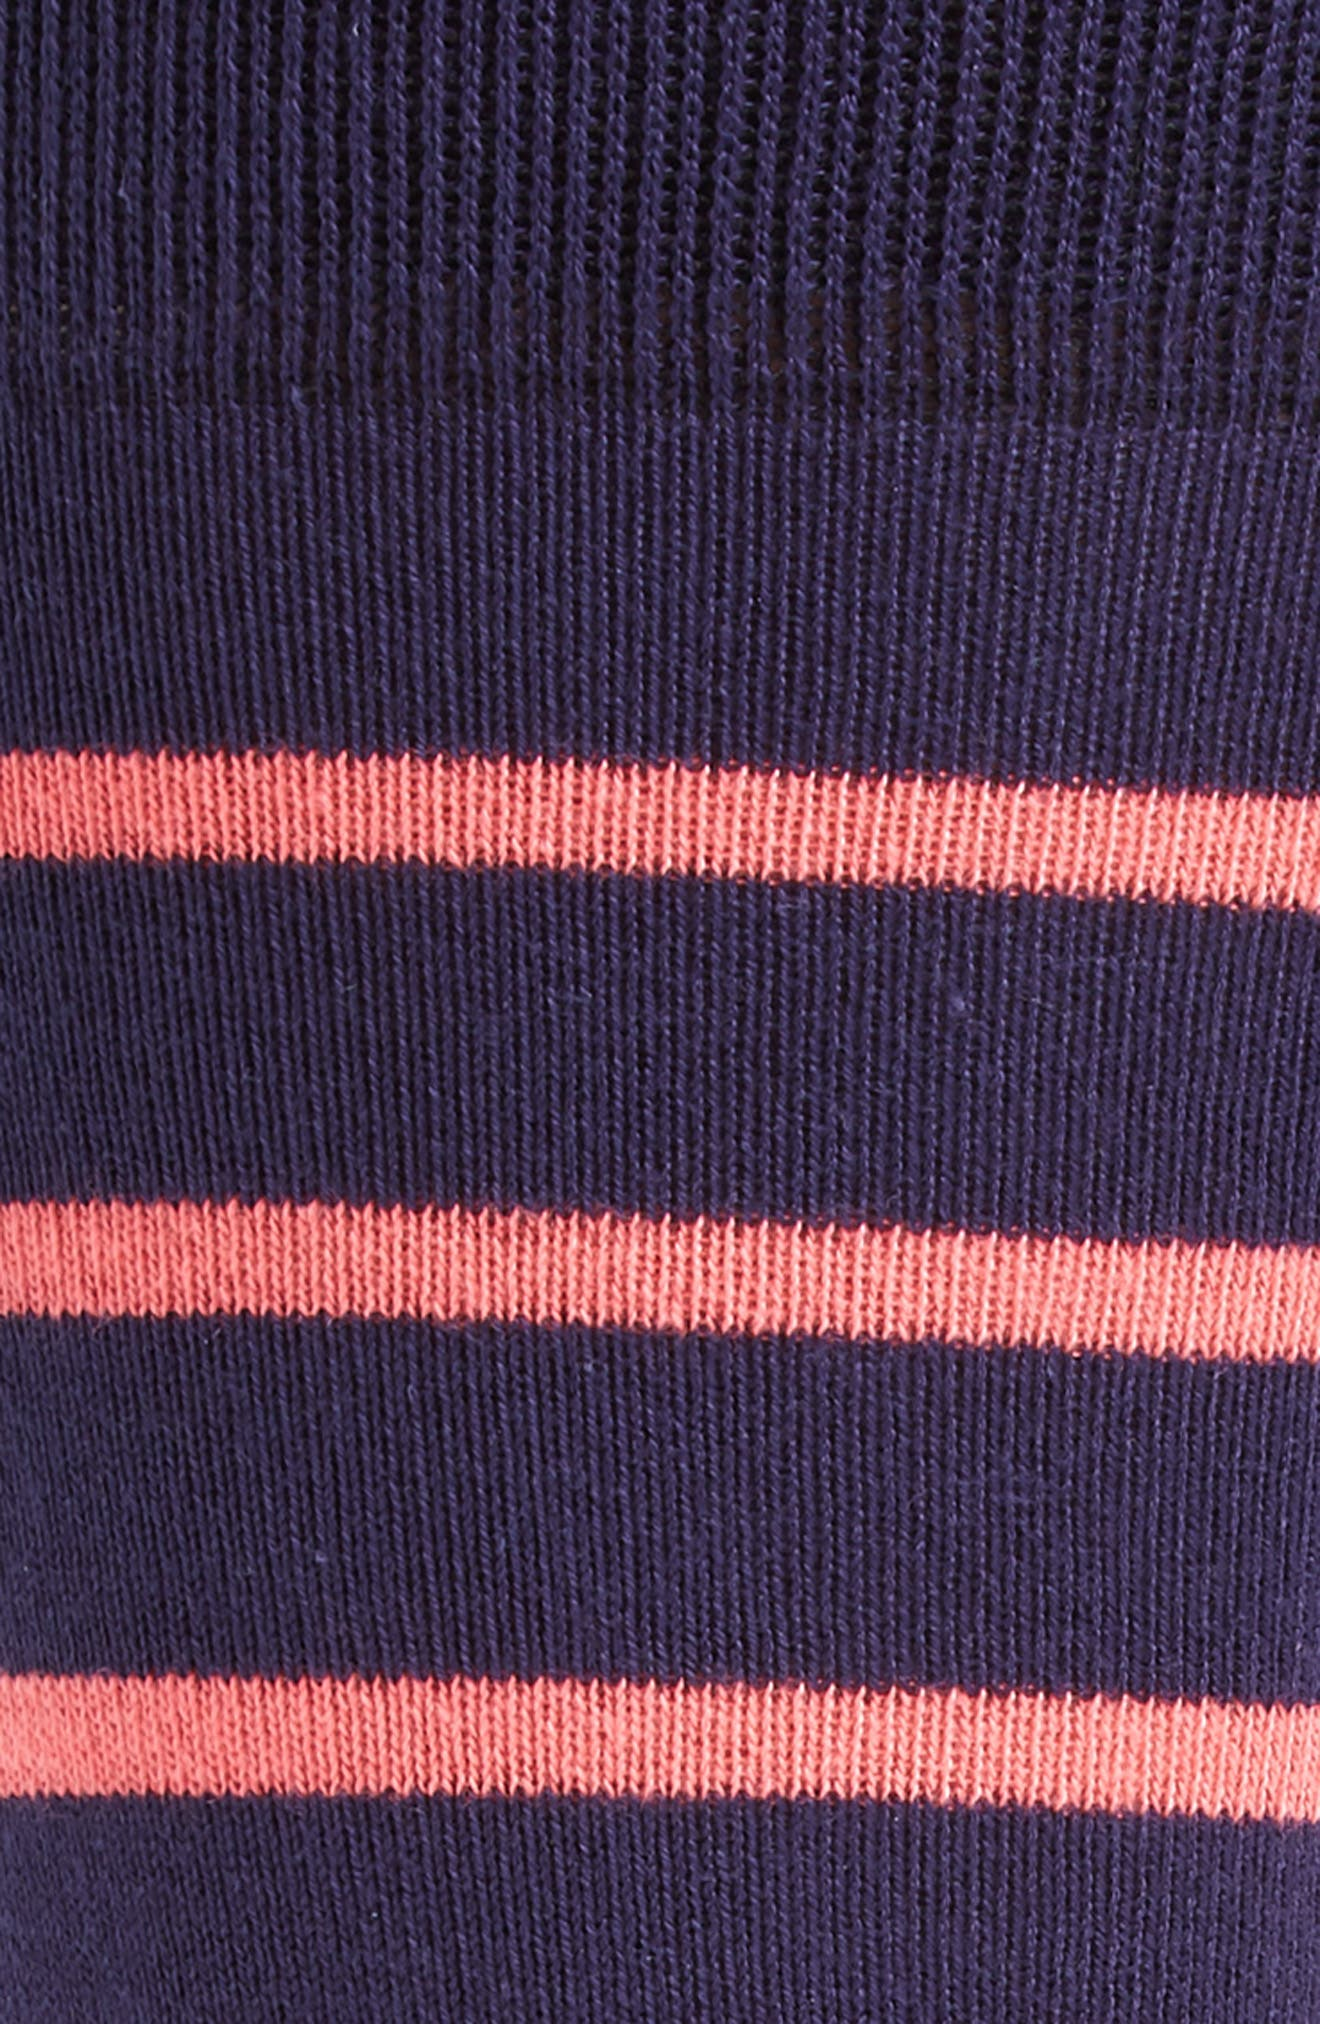 Stripe Crew Socks,                             Alternate thumbnail 2, color,                             Black/ Pink